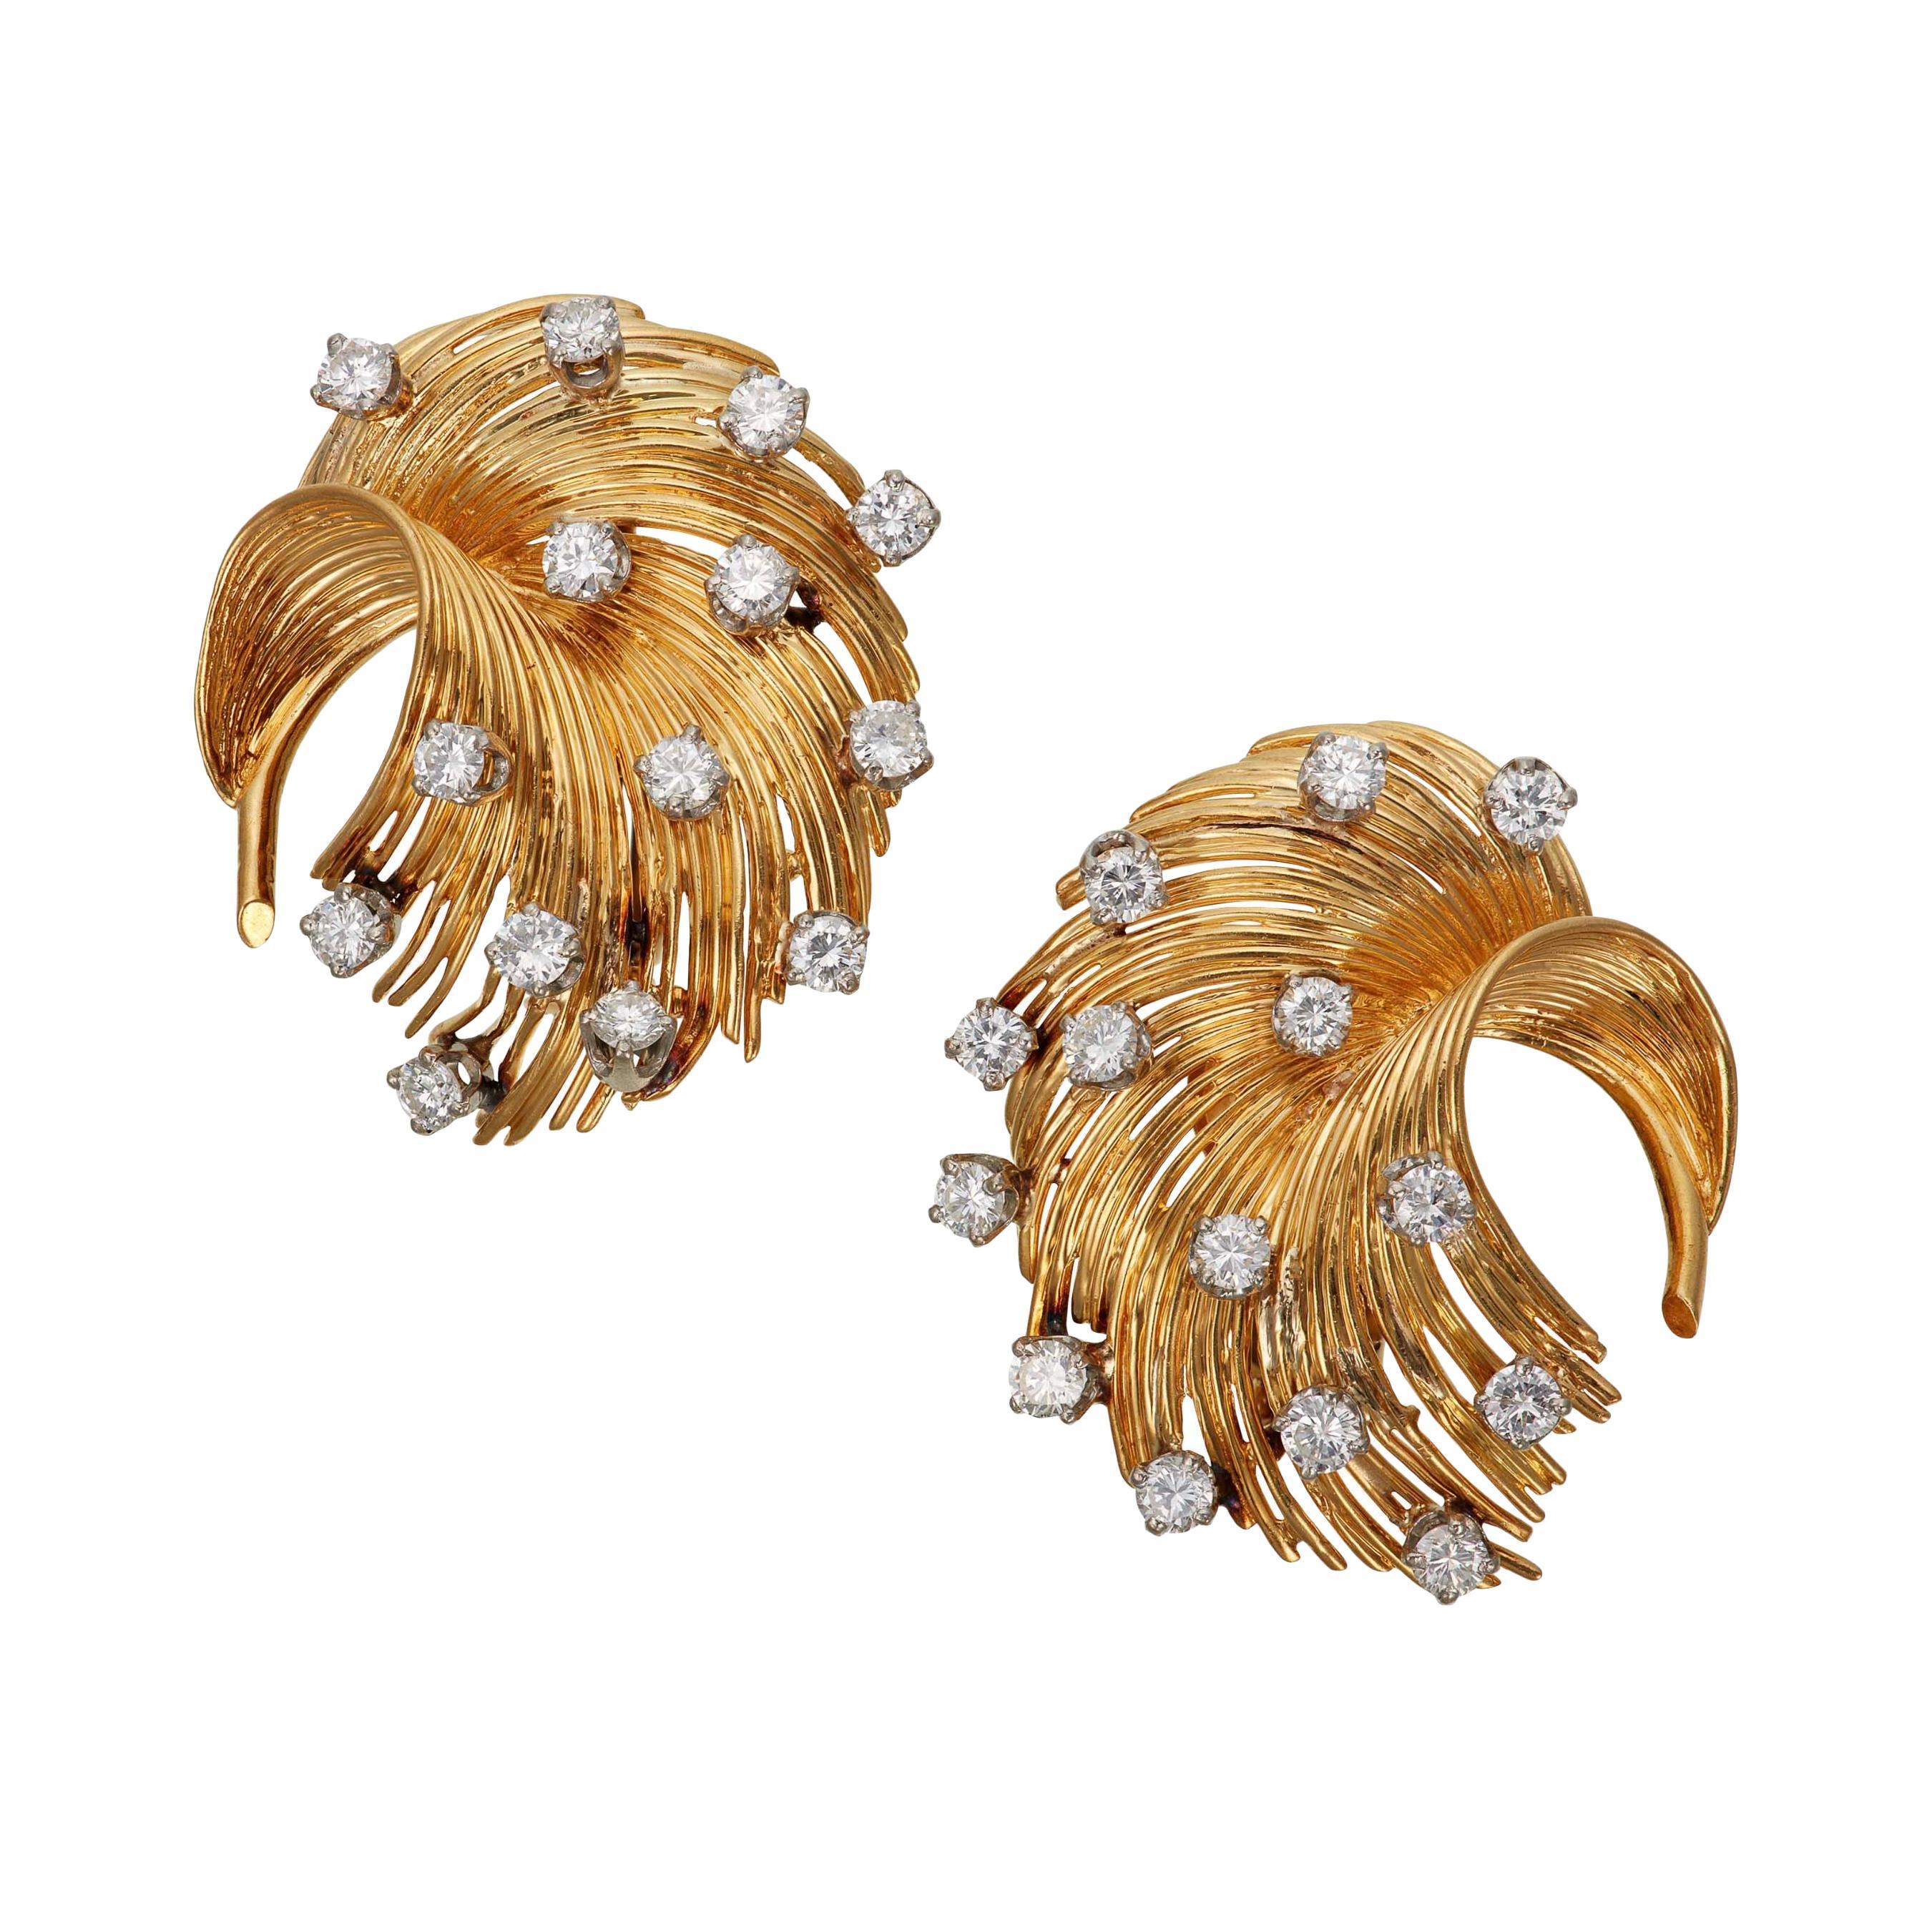 Tiffany & Co. Diamond and Gold Earrings